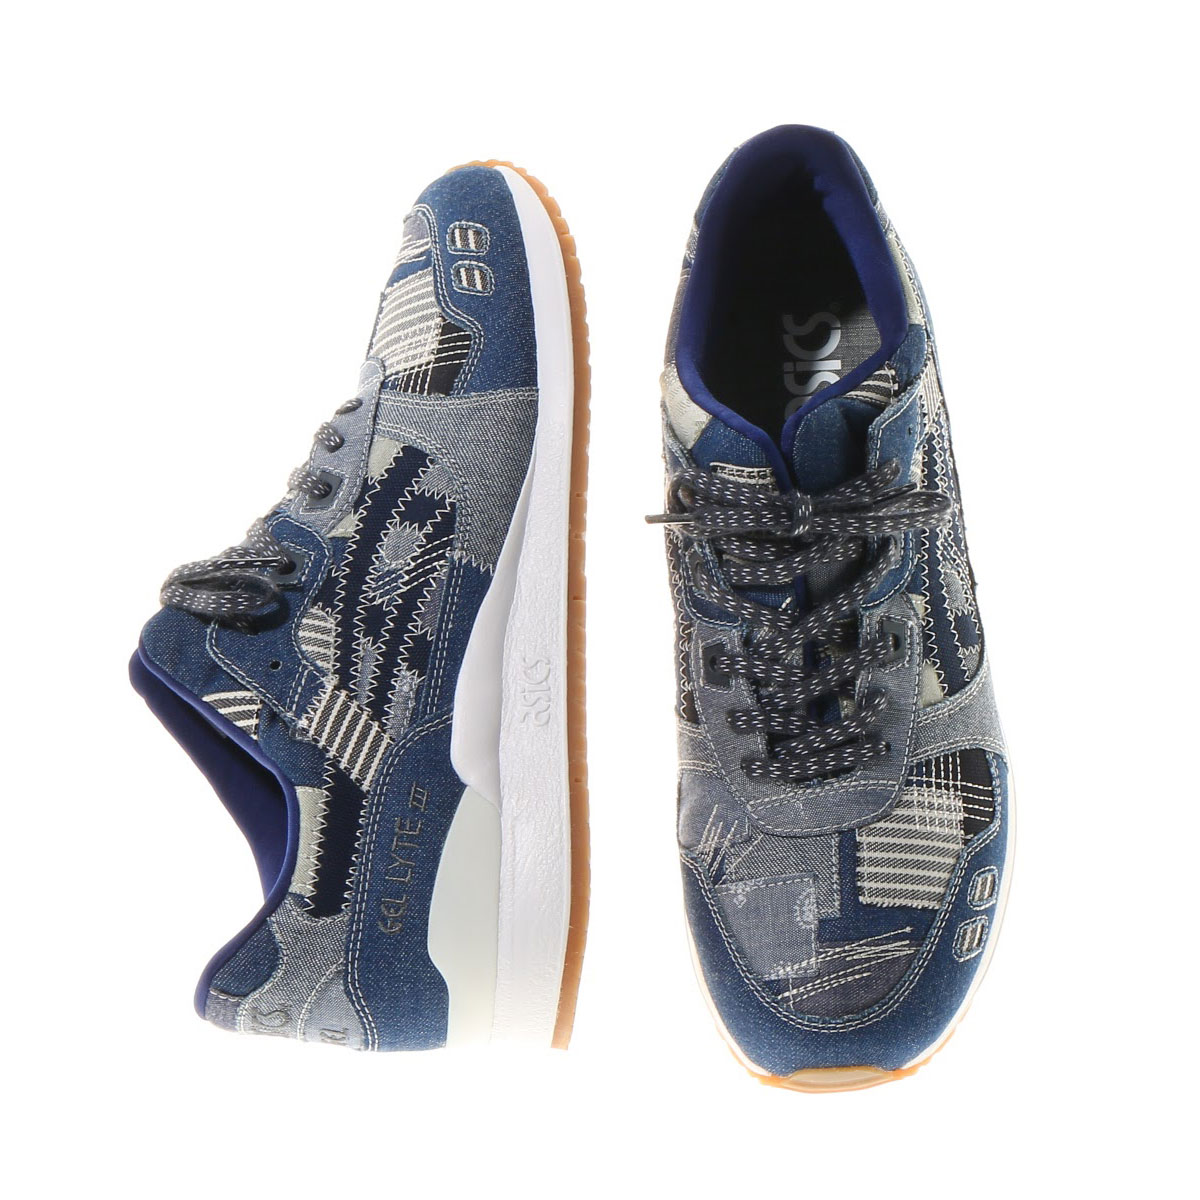 asics tiger gel-lyte ii ranru pack indigo blue 2